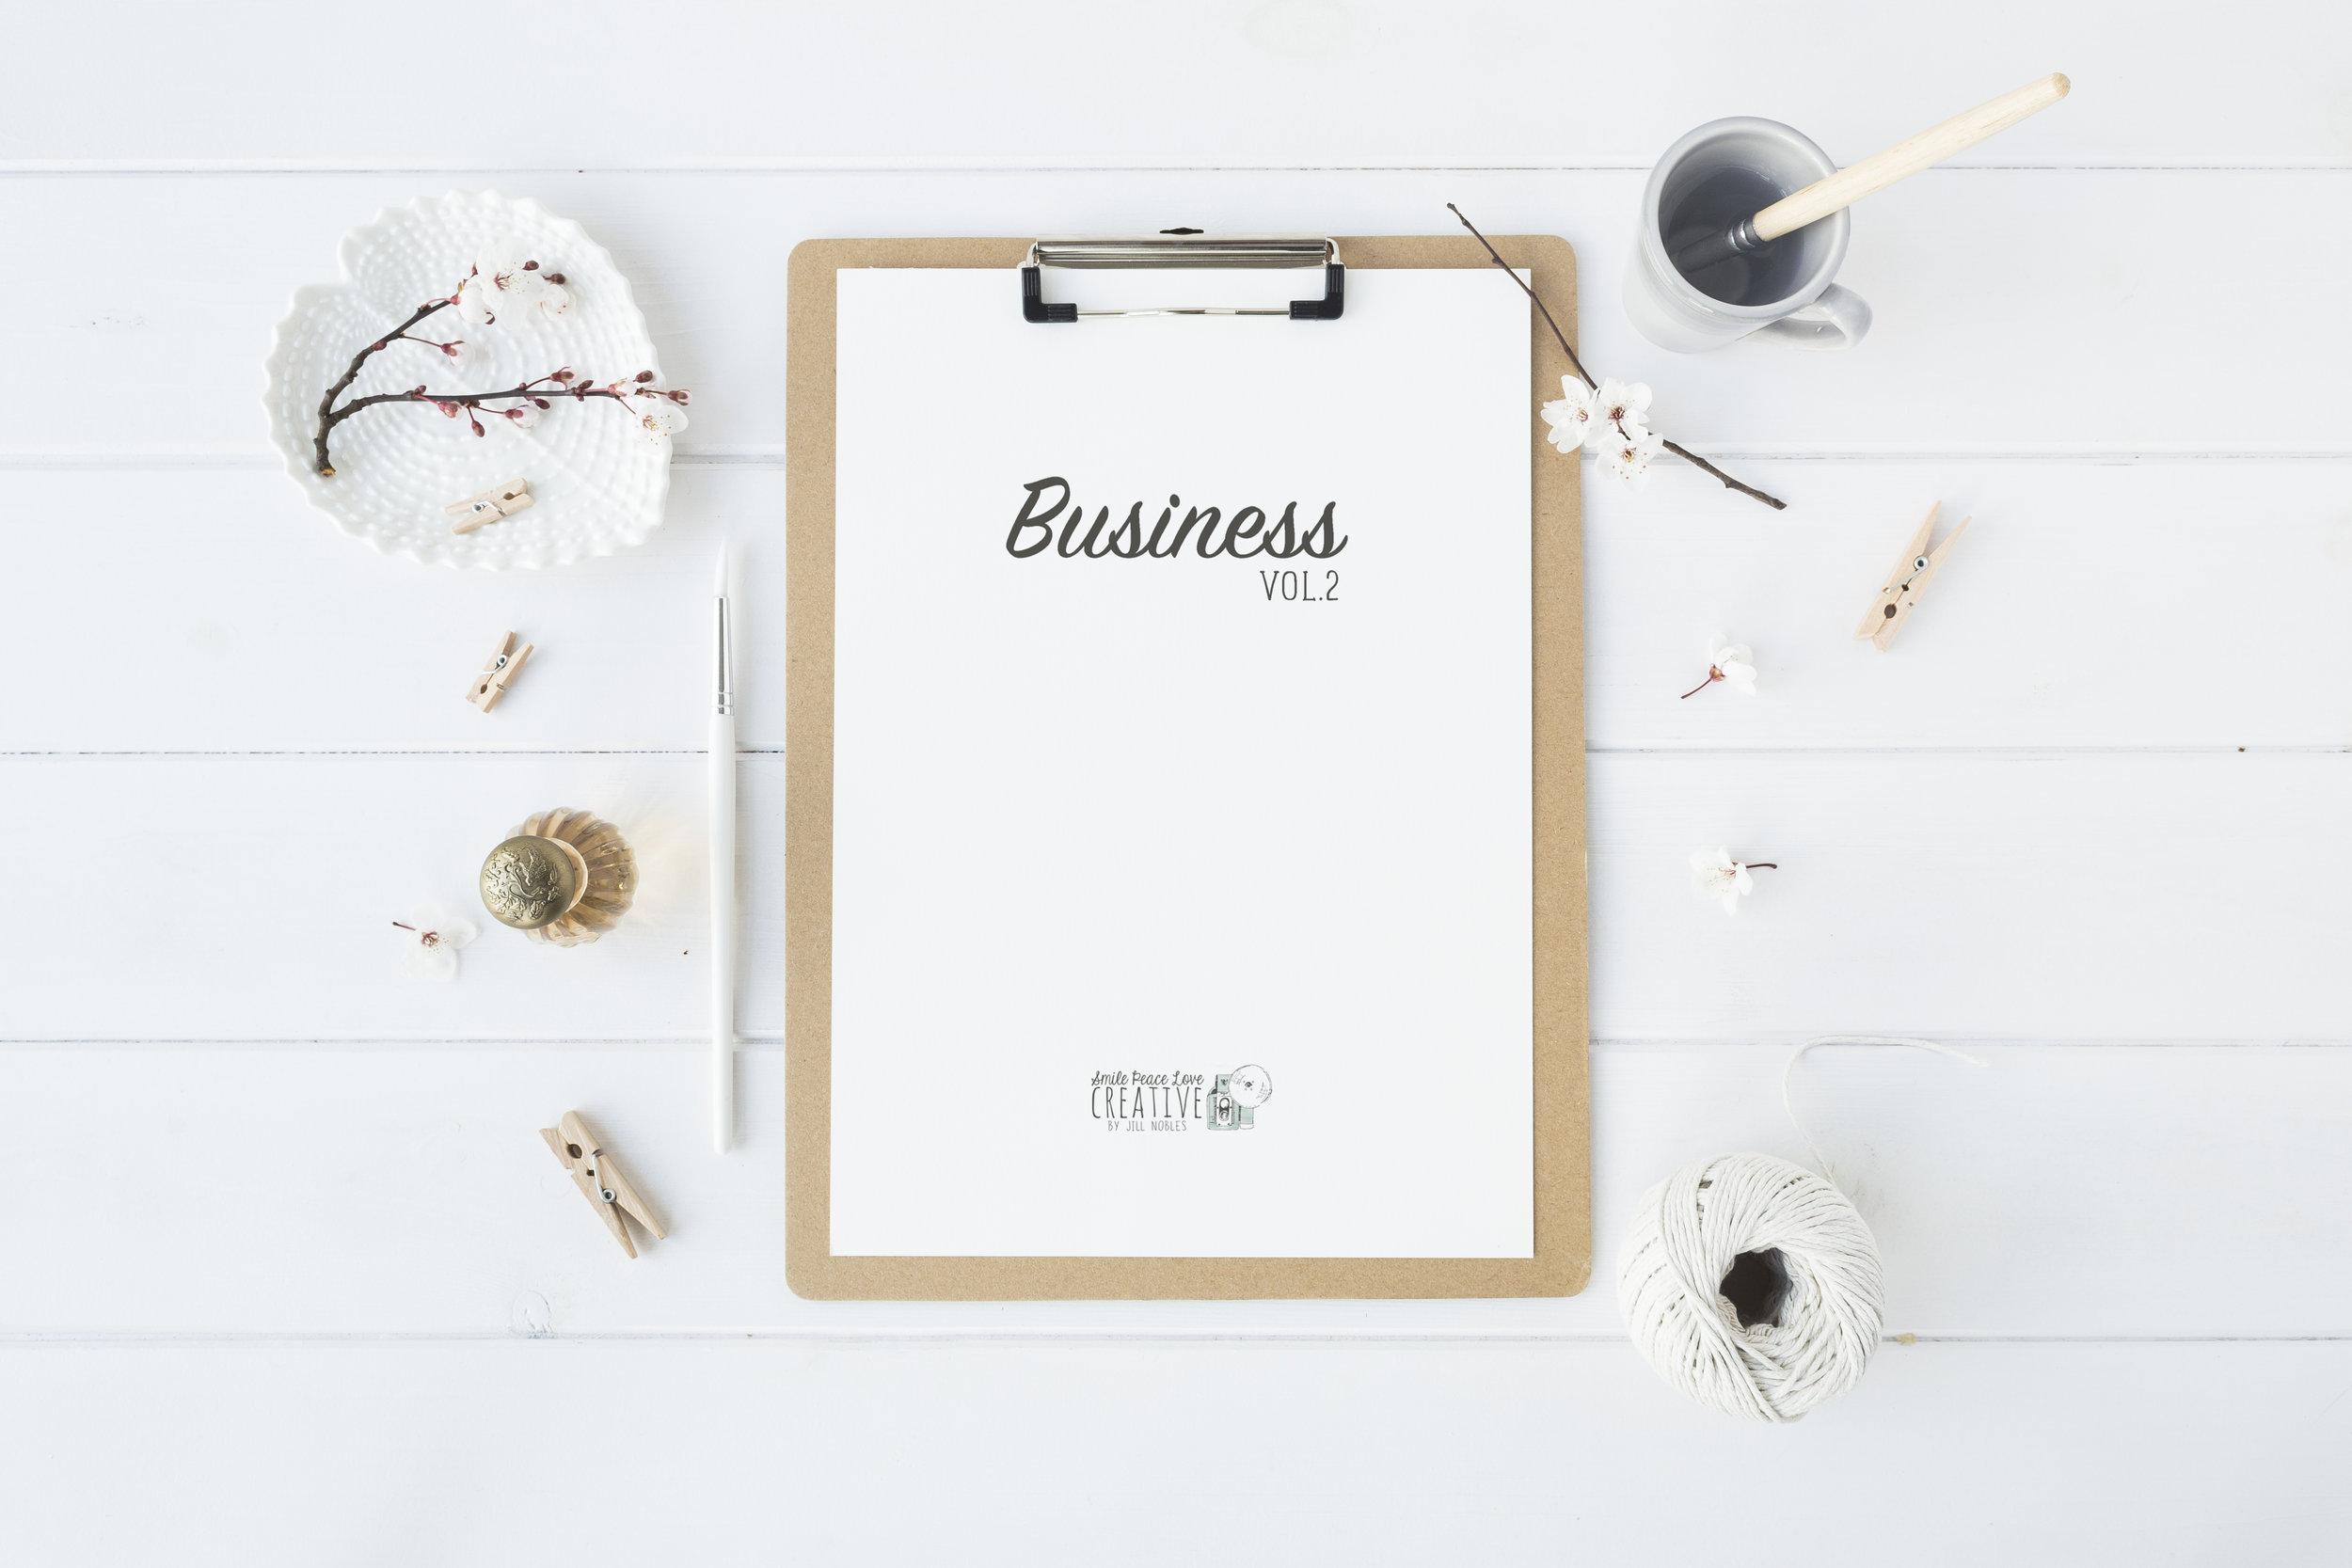 Business_Vol2_MOCKUP.jpg